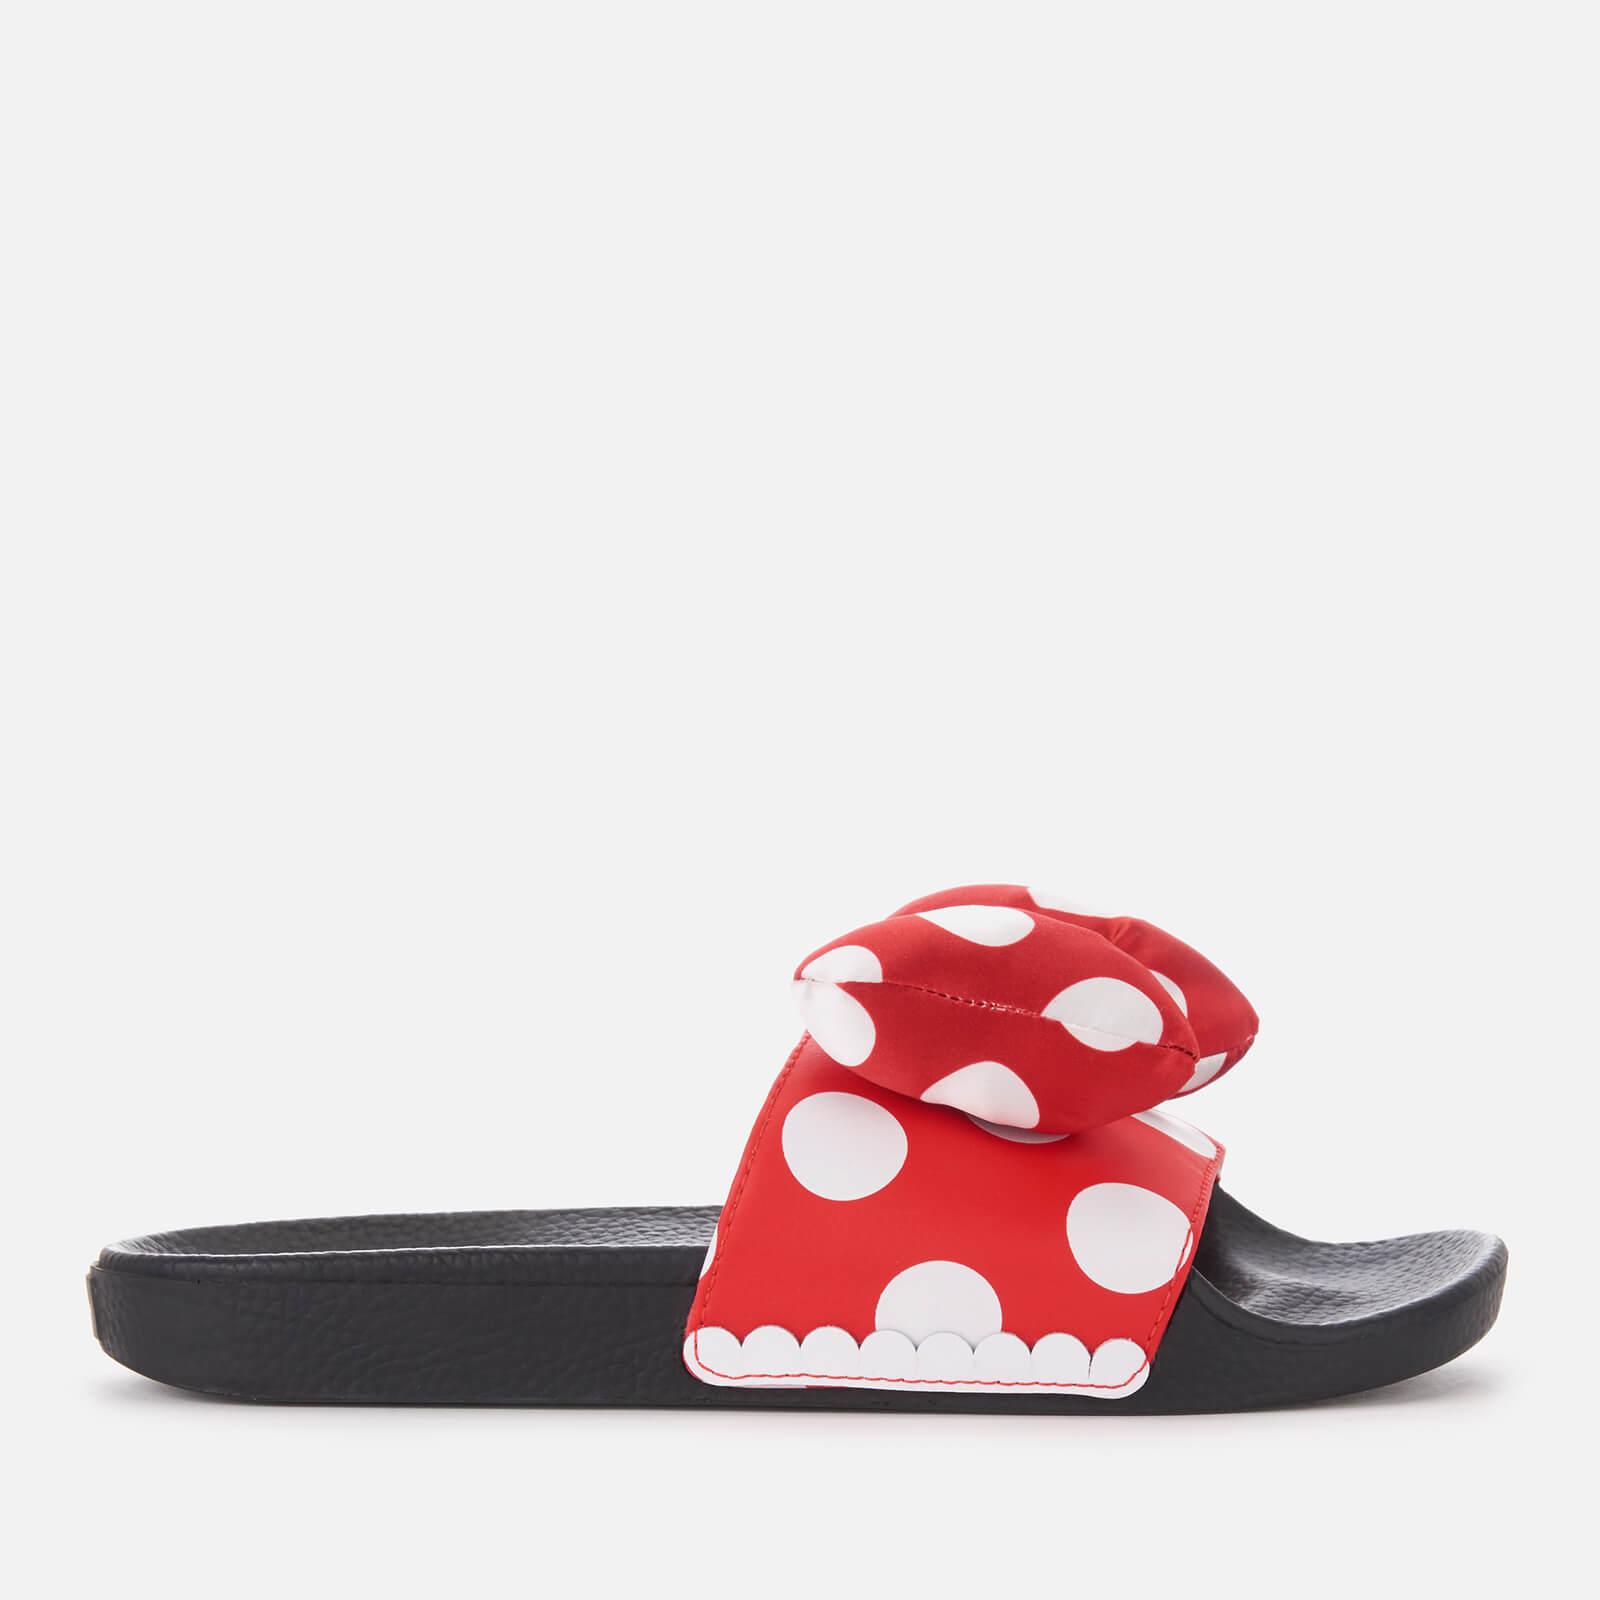 Disney Minnie's Bow Slide Sandals